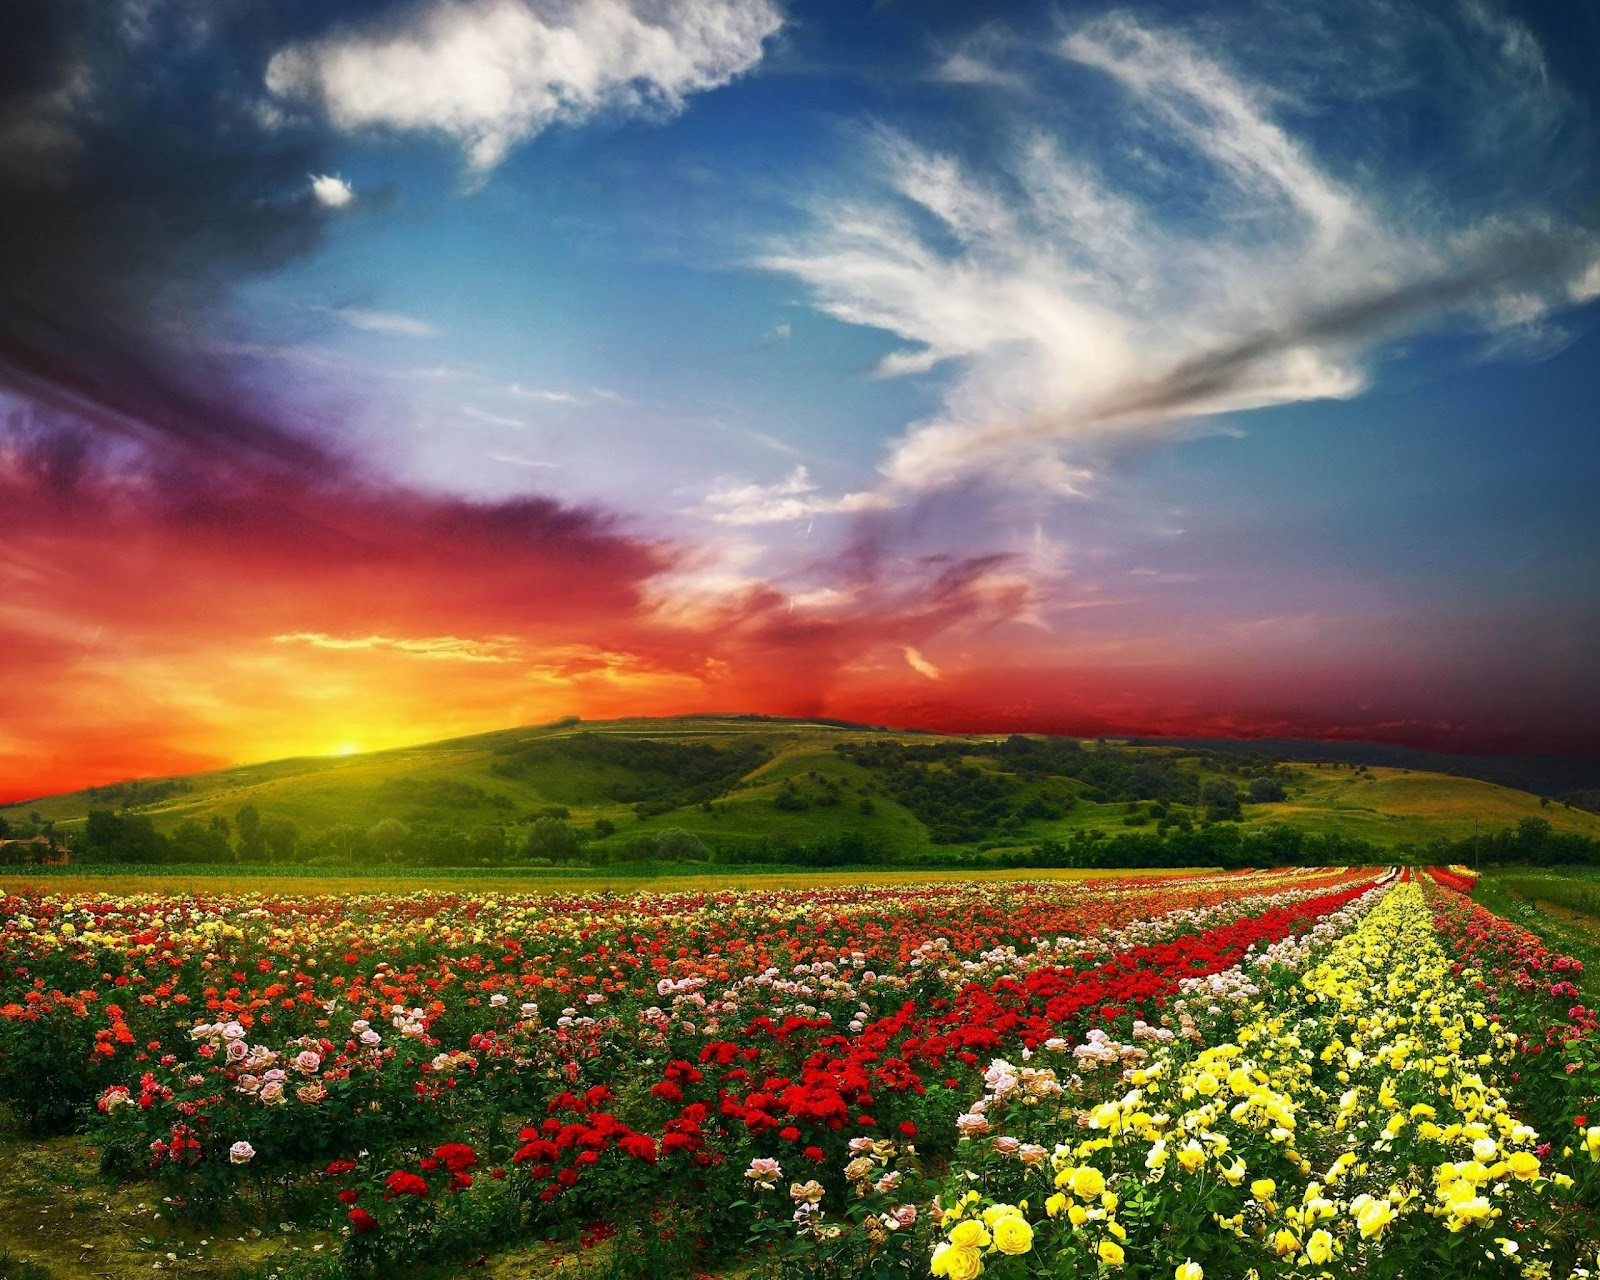 http://3.bp.blogspot.com/-SjEeh5-OSEc/UA093TOIG0I/AAAAAAAACpQ/RjQrHaDxJs4/s1600/bulgaria-scenery-rose-valley-countryside-flowers-clouds-horizon-sun-landscape.jpg